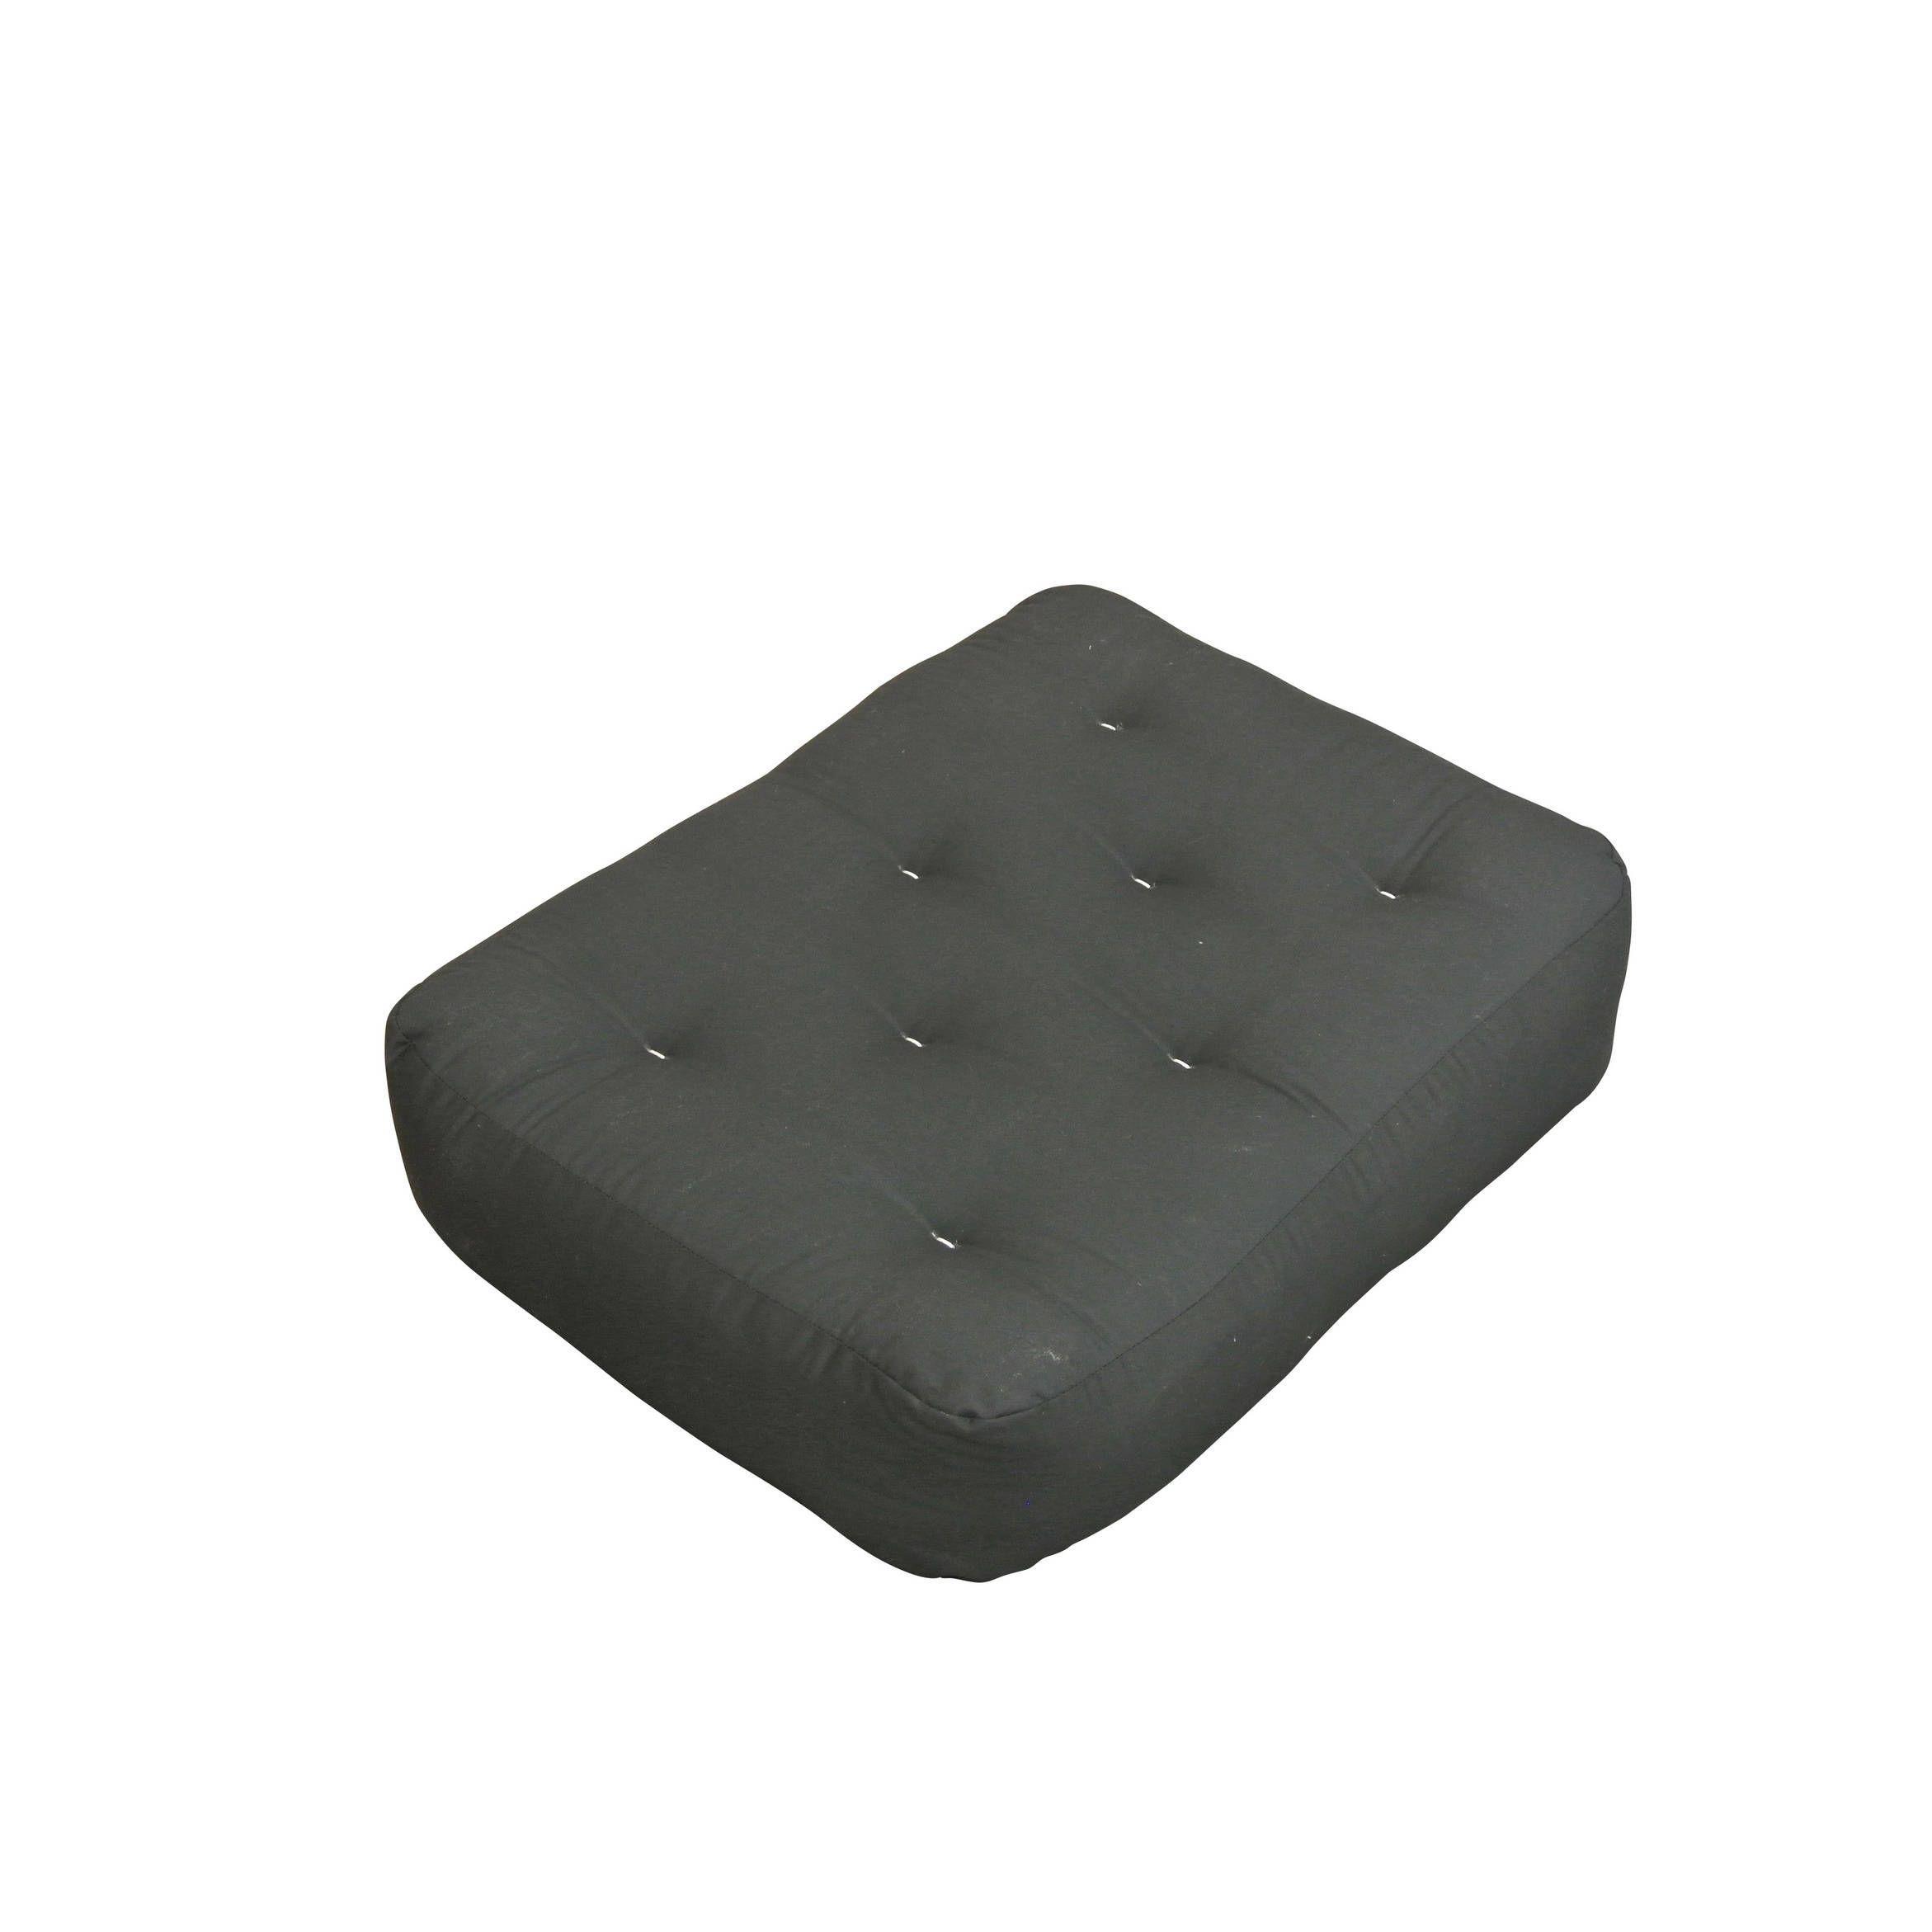 9 Triple Foam And Cotton Chair Ottoman Black Duct Futon Mattress Polyester Blend Inch